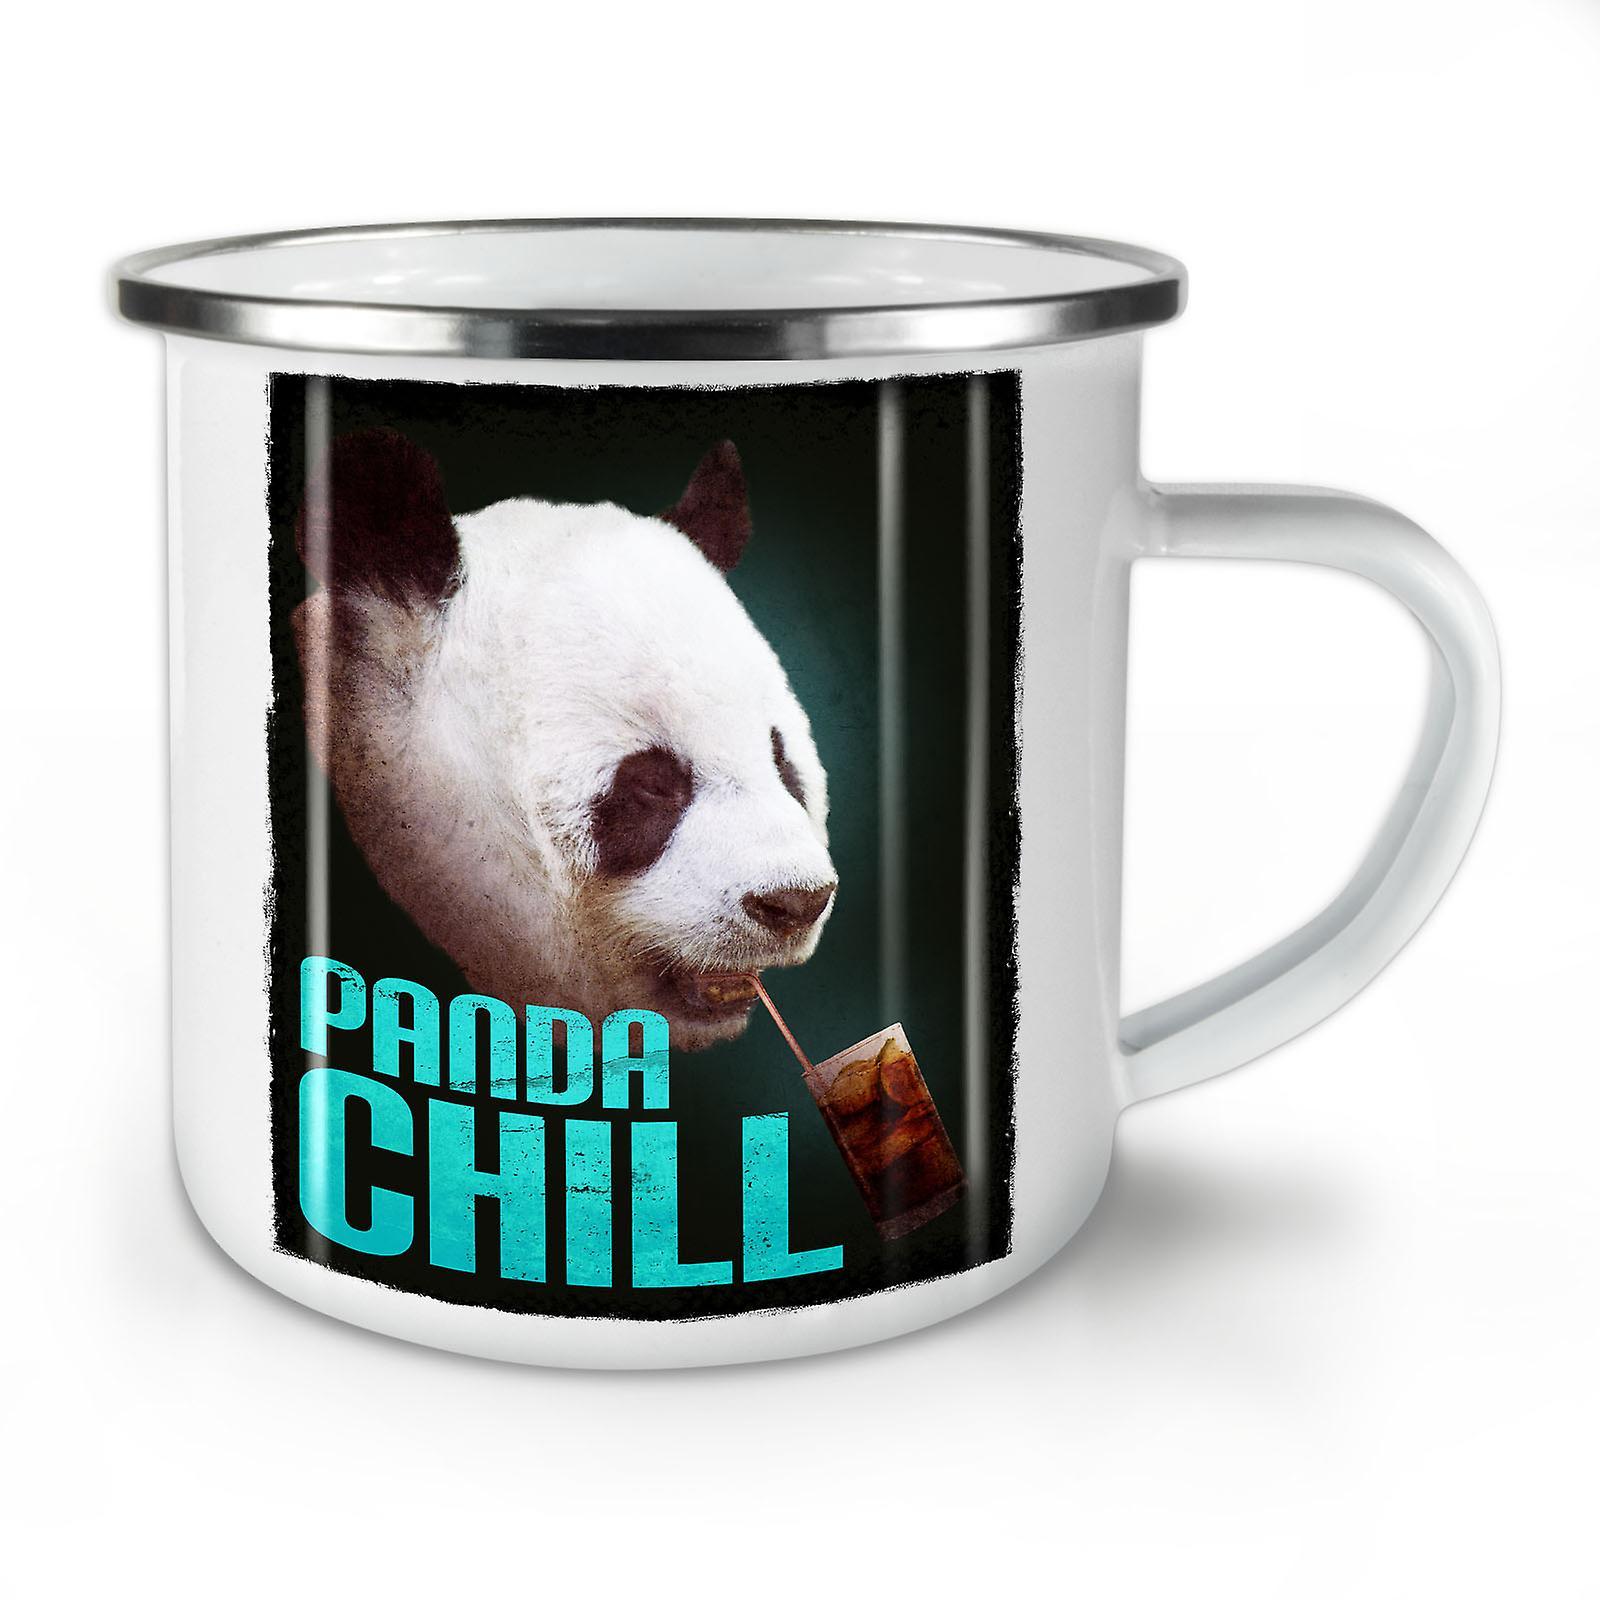 Panda Nouveau Whitetea OzWellcoda Café Émail Mignon Chill Mug10 LpGjSUzVqM